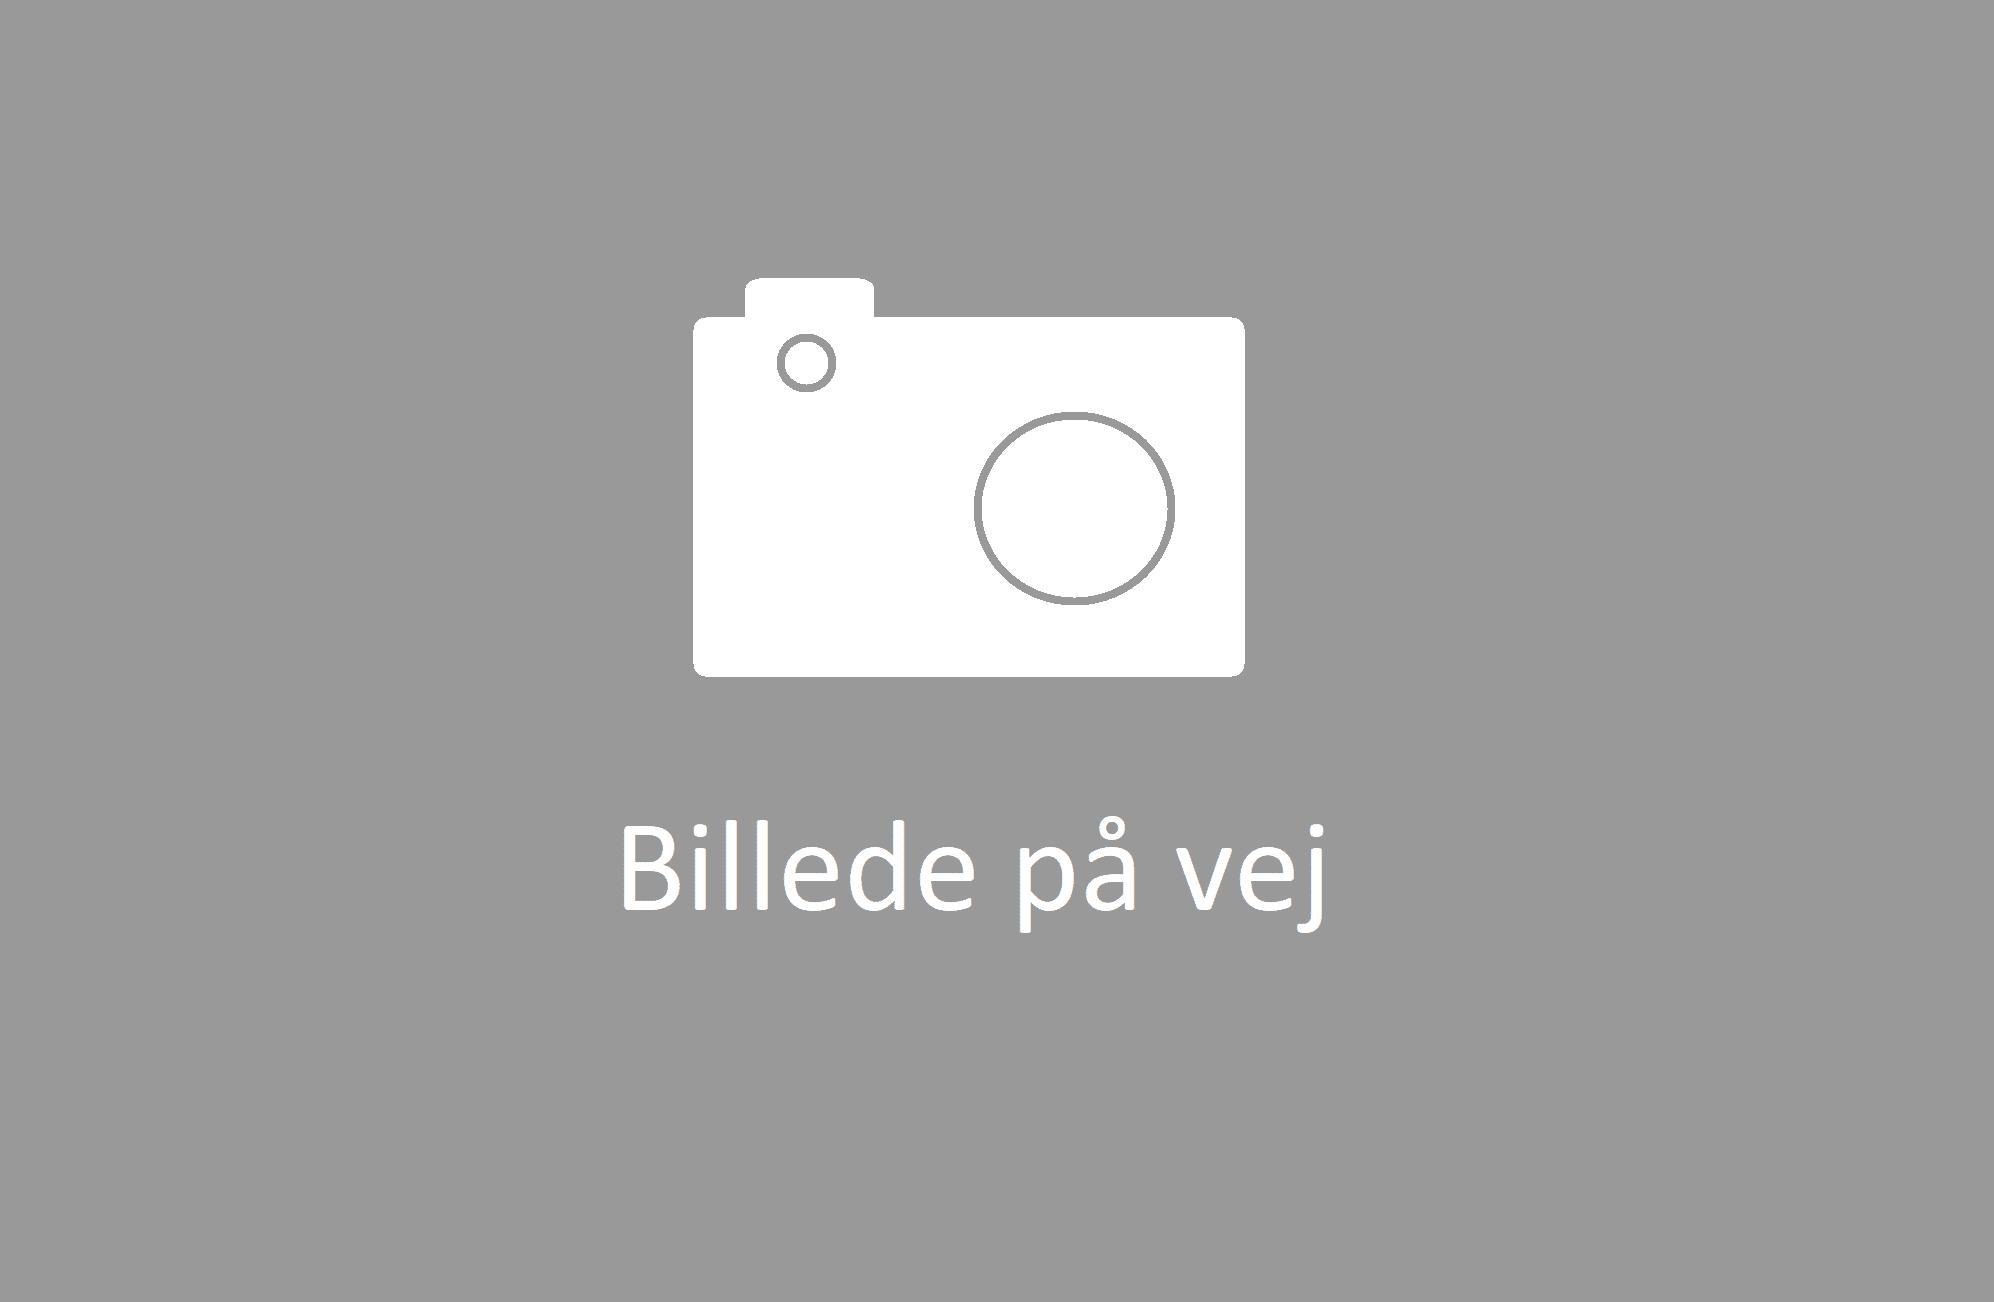 billede-paa-vej